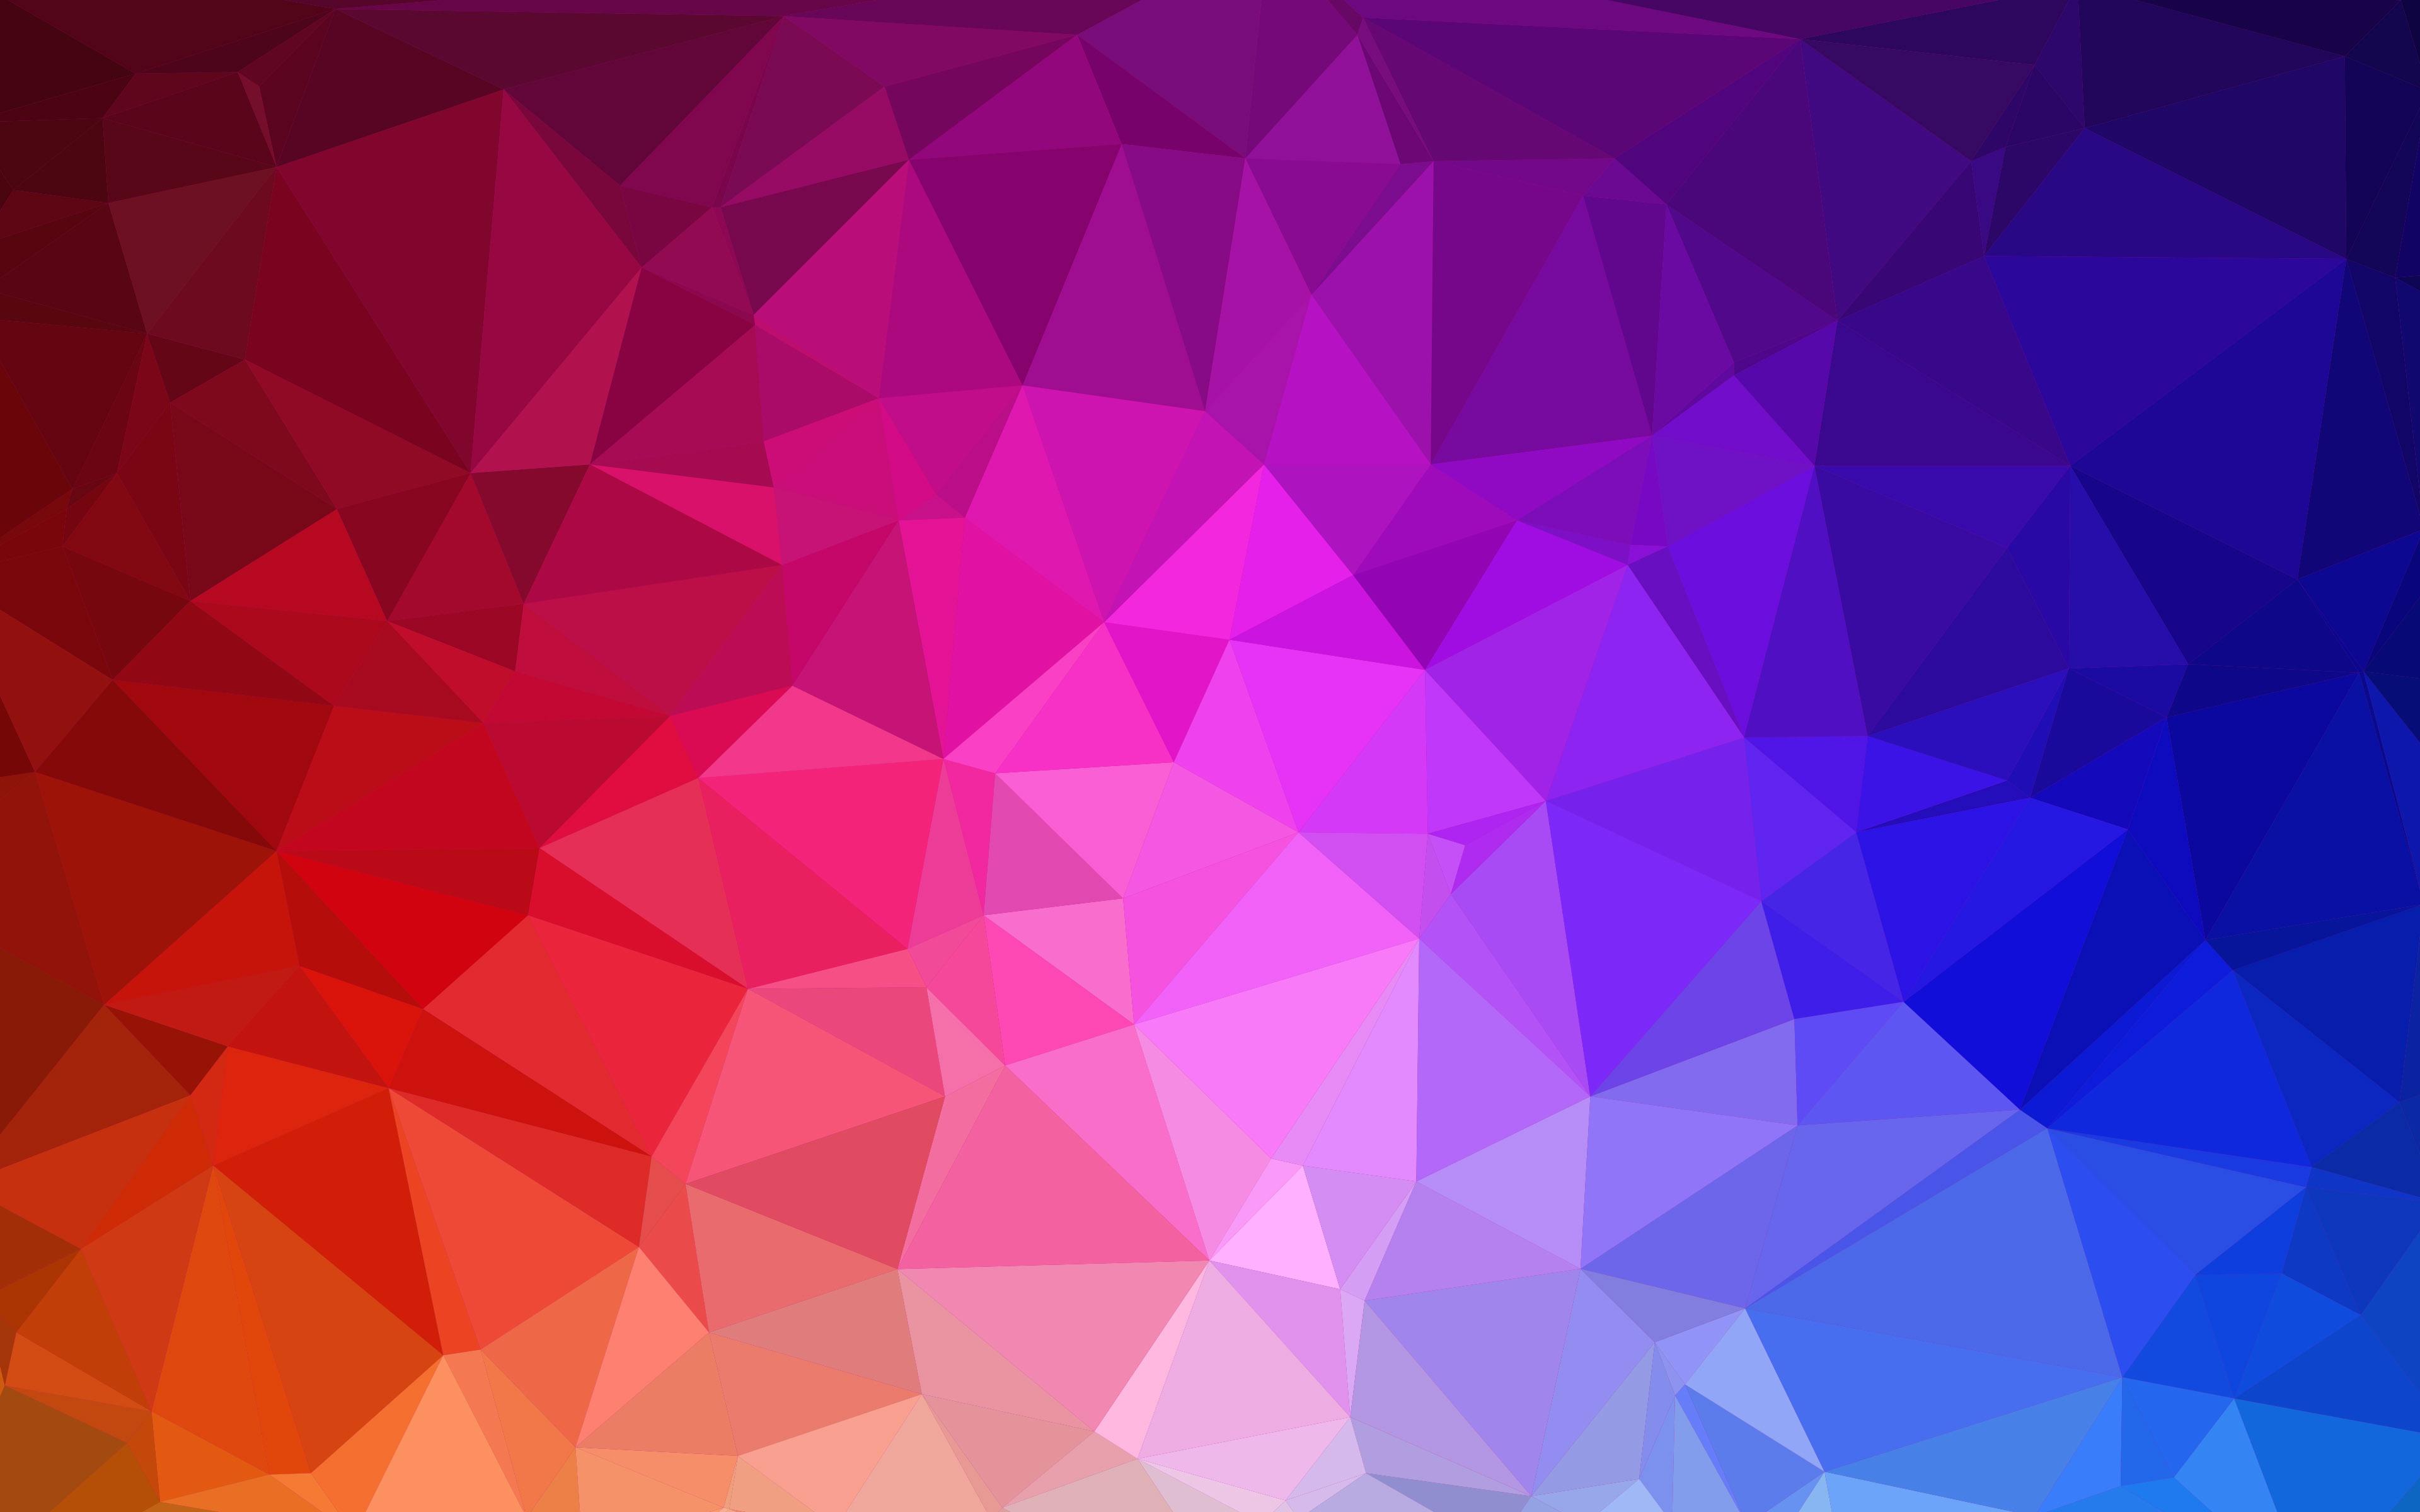 FunMozar Colorful Geometric Wallpapers 3840x2400